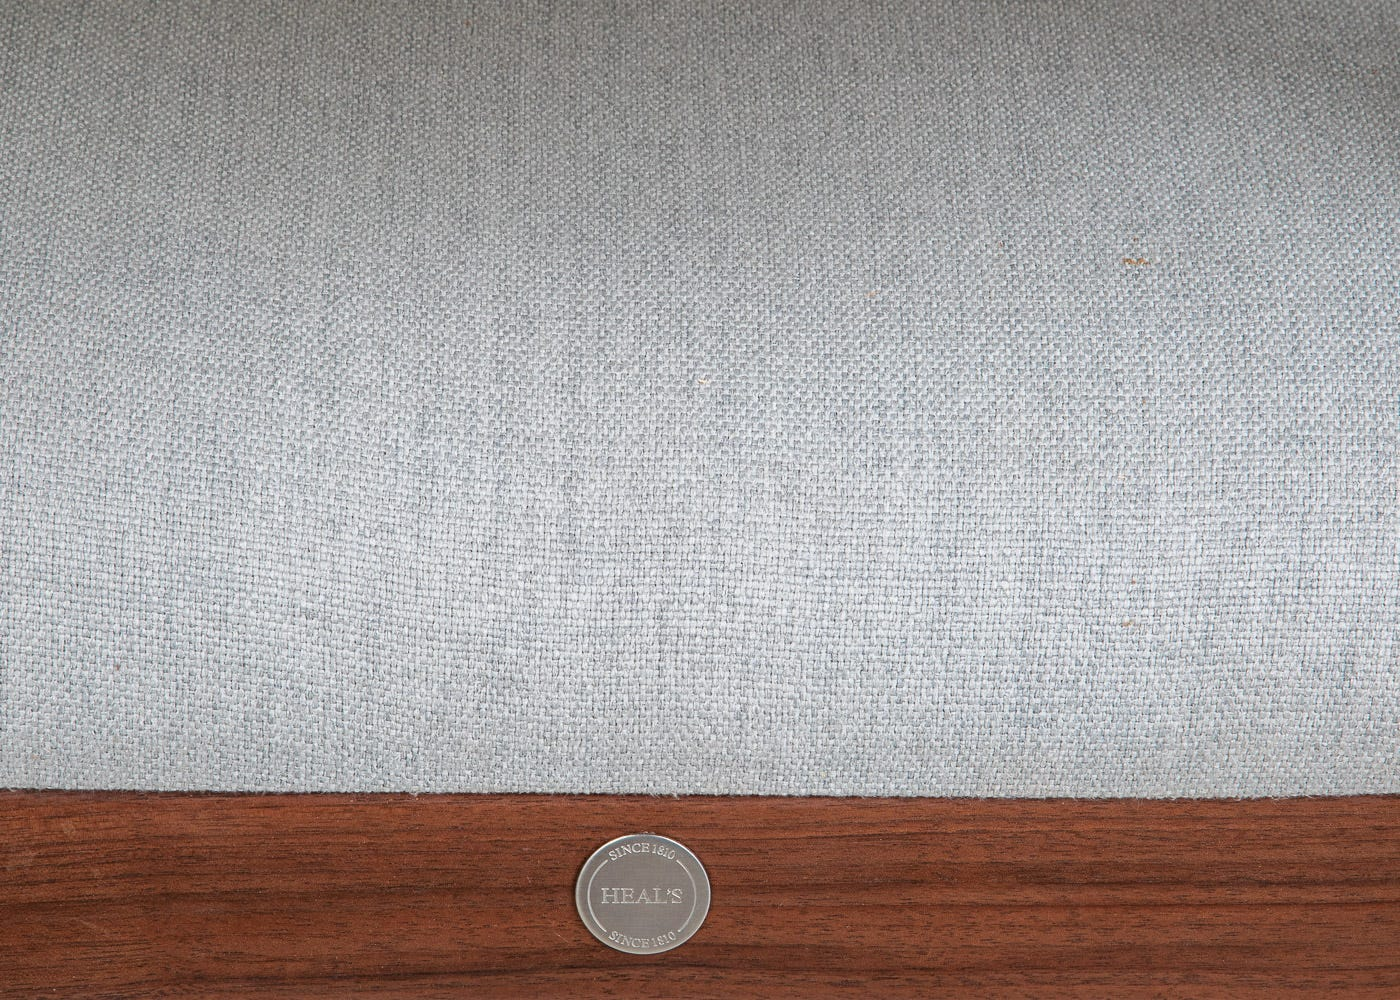 Charcoal grey upholstery.